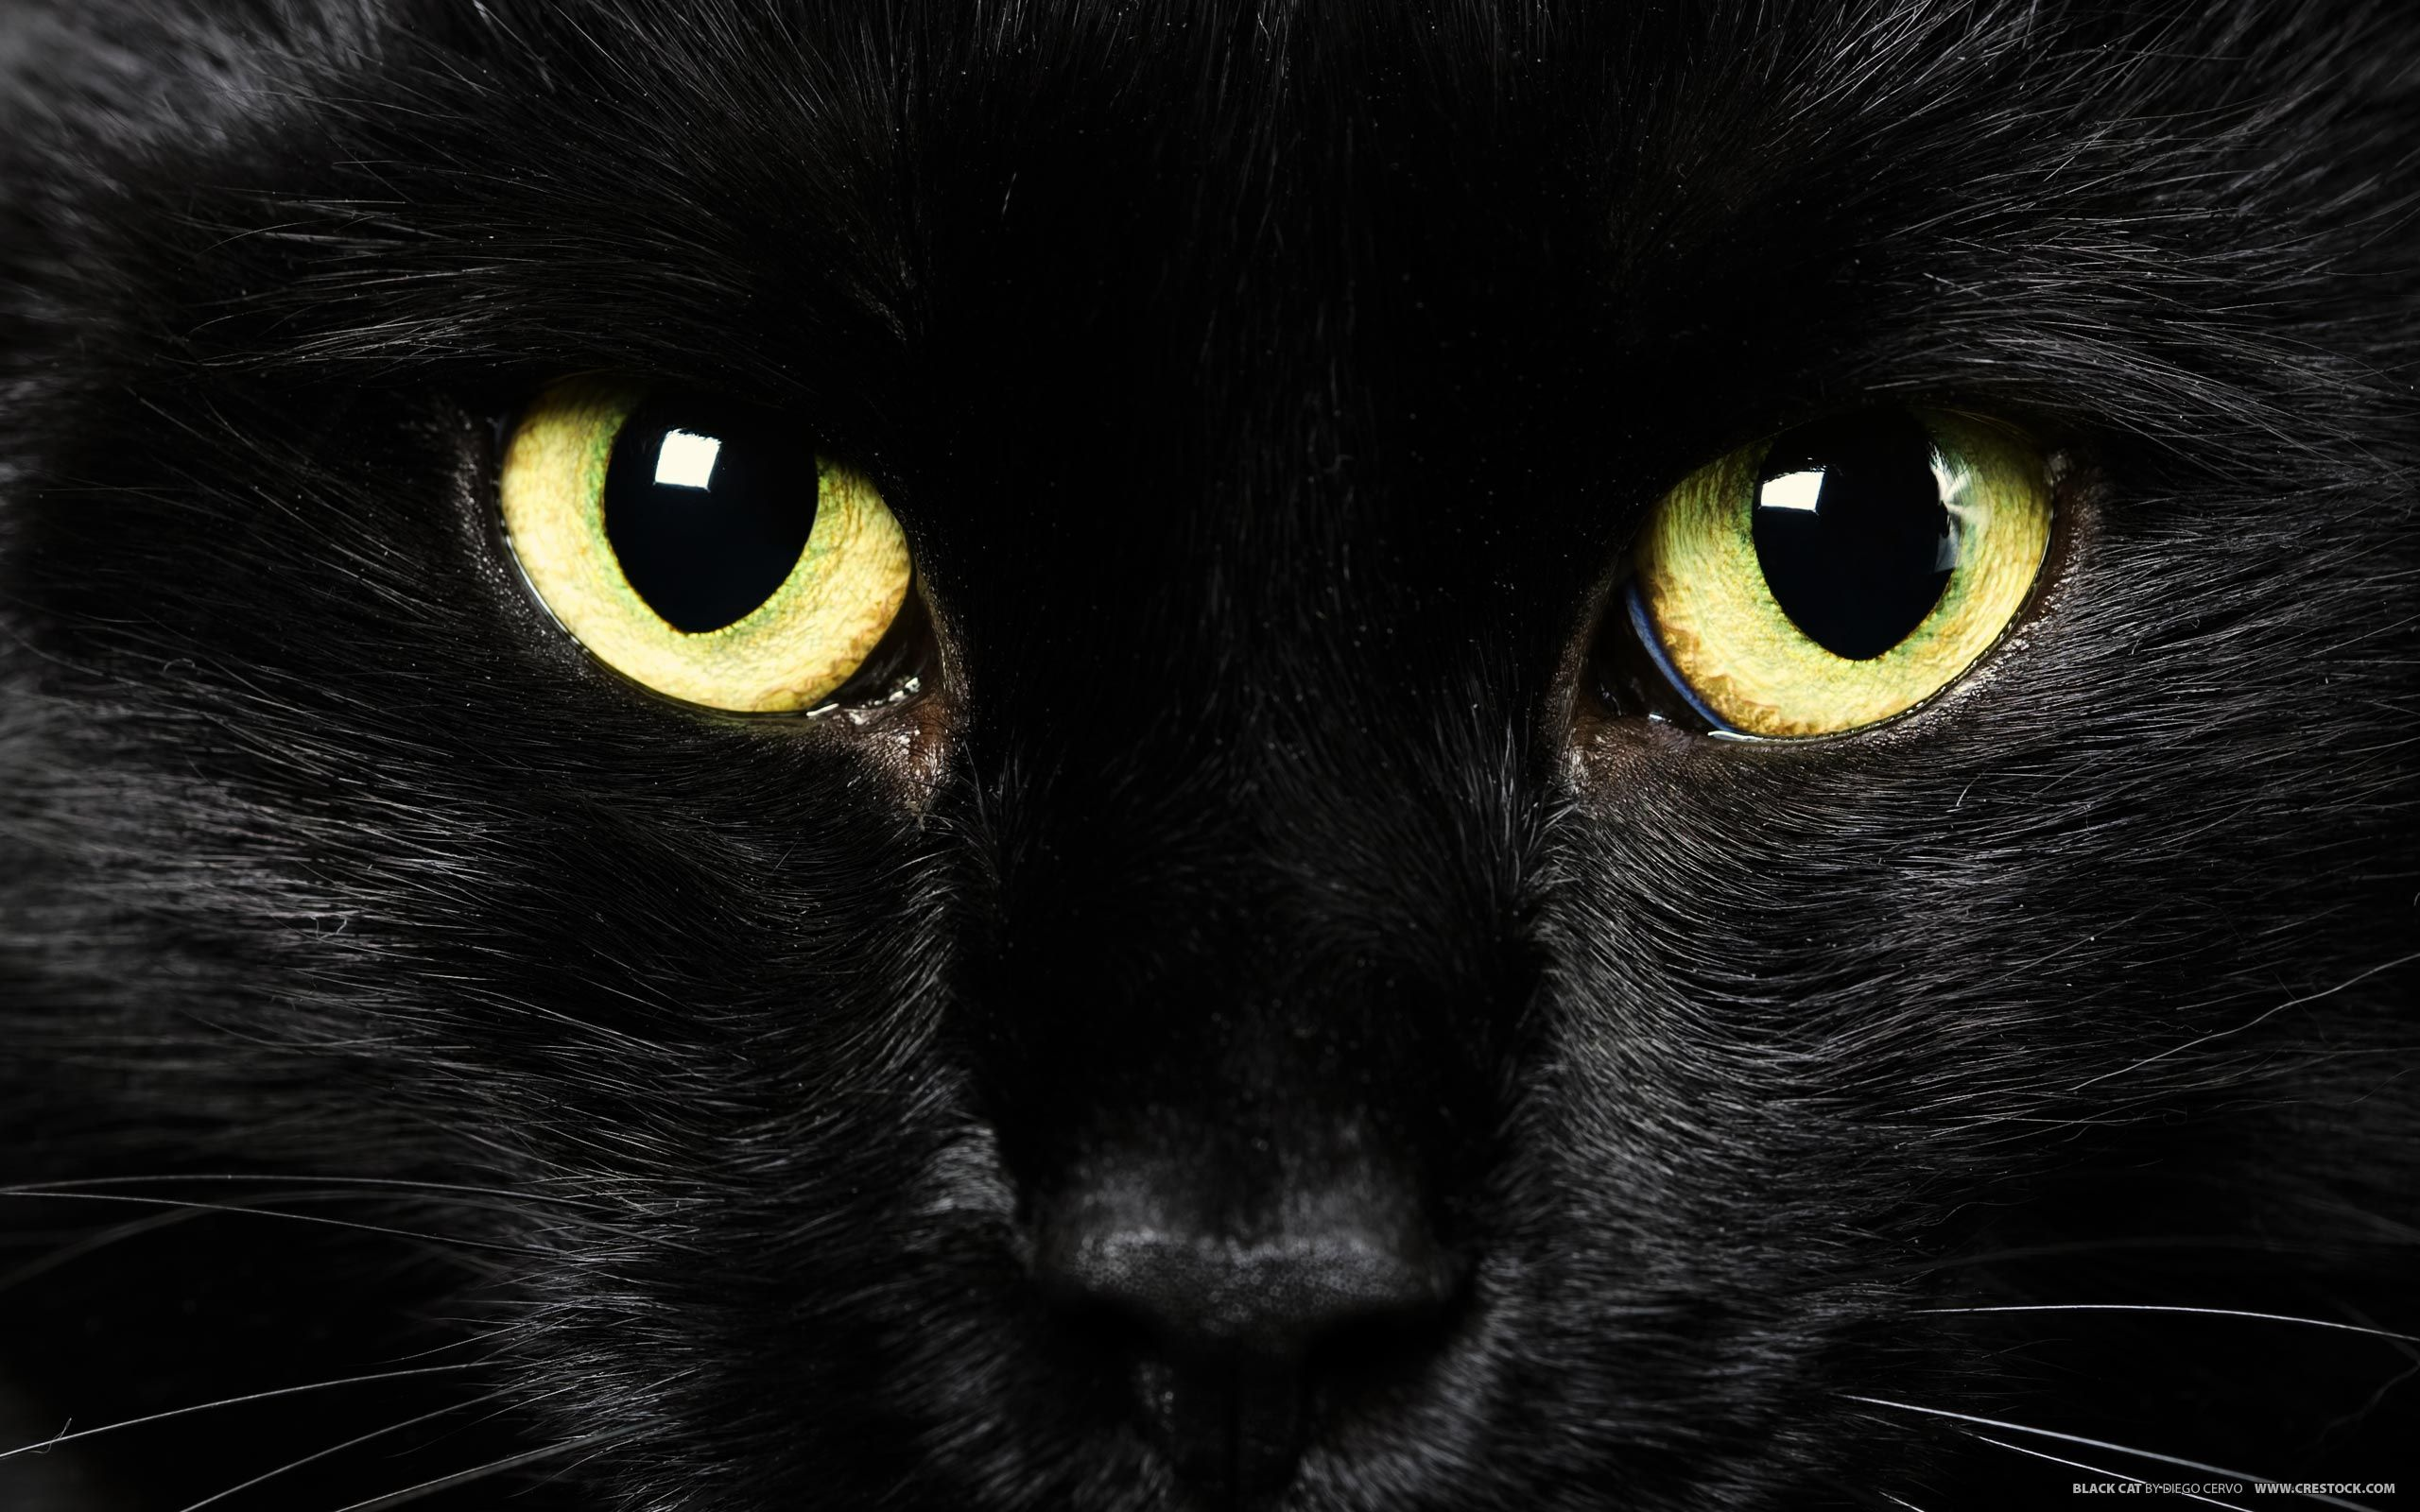 HD Wallpapers bLACK Cat Images Black cat superstition